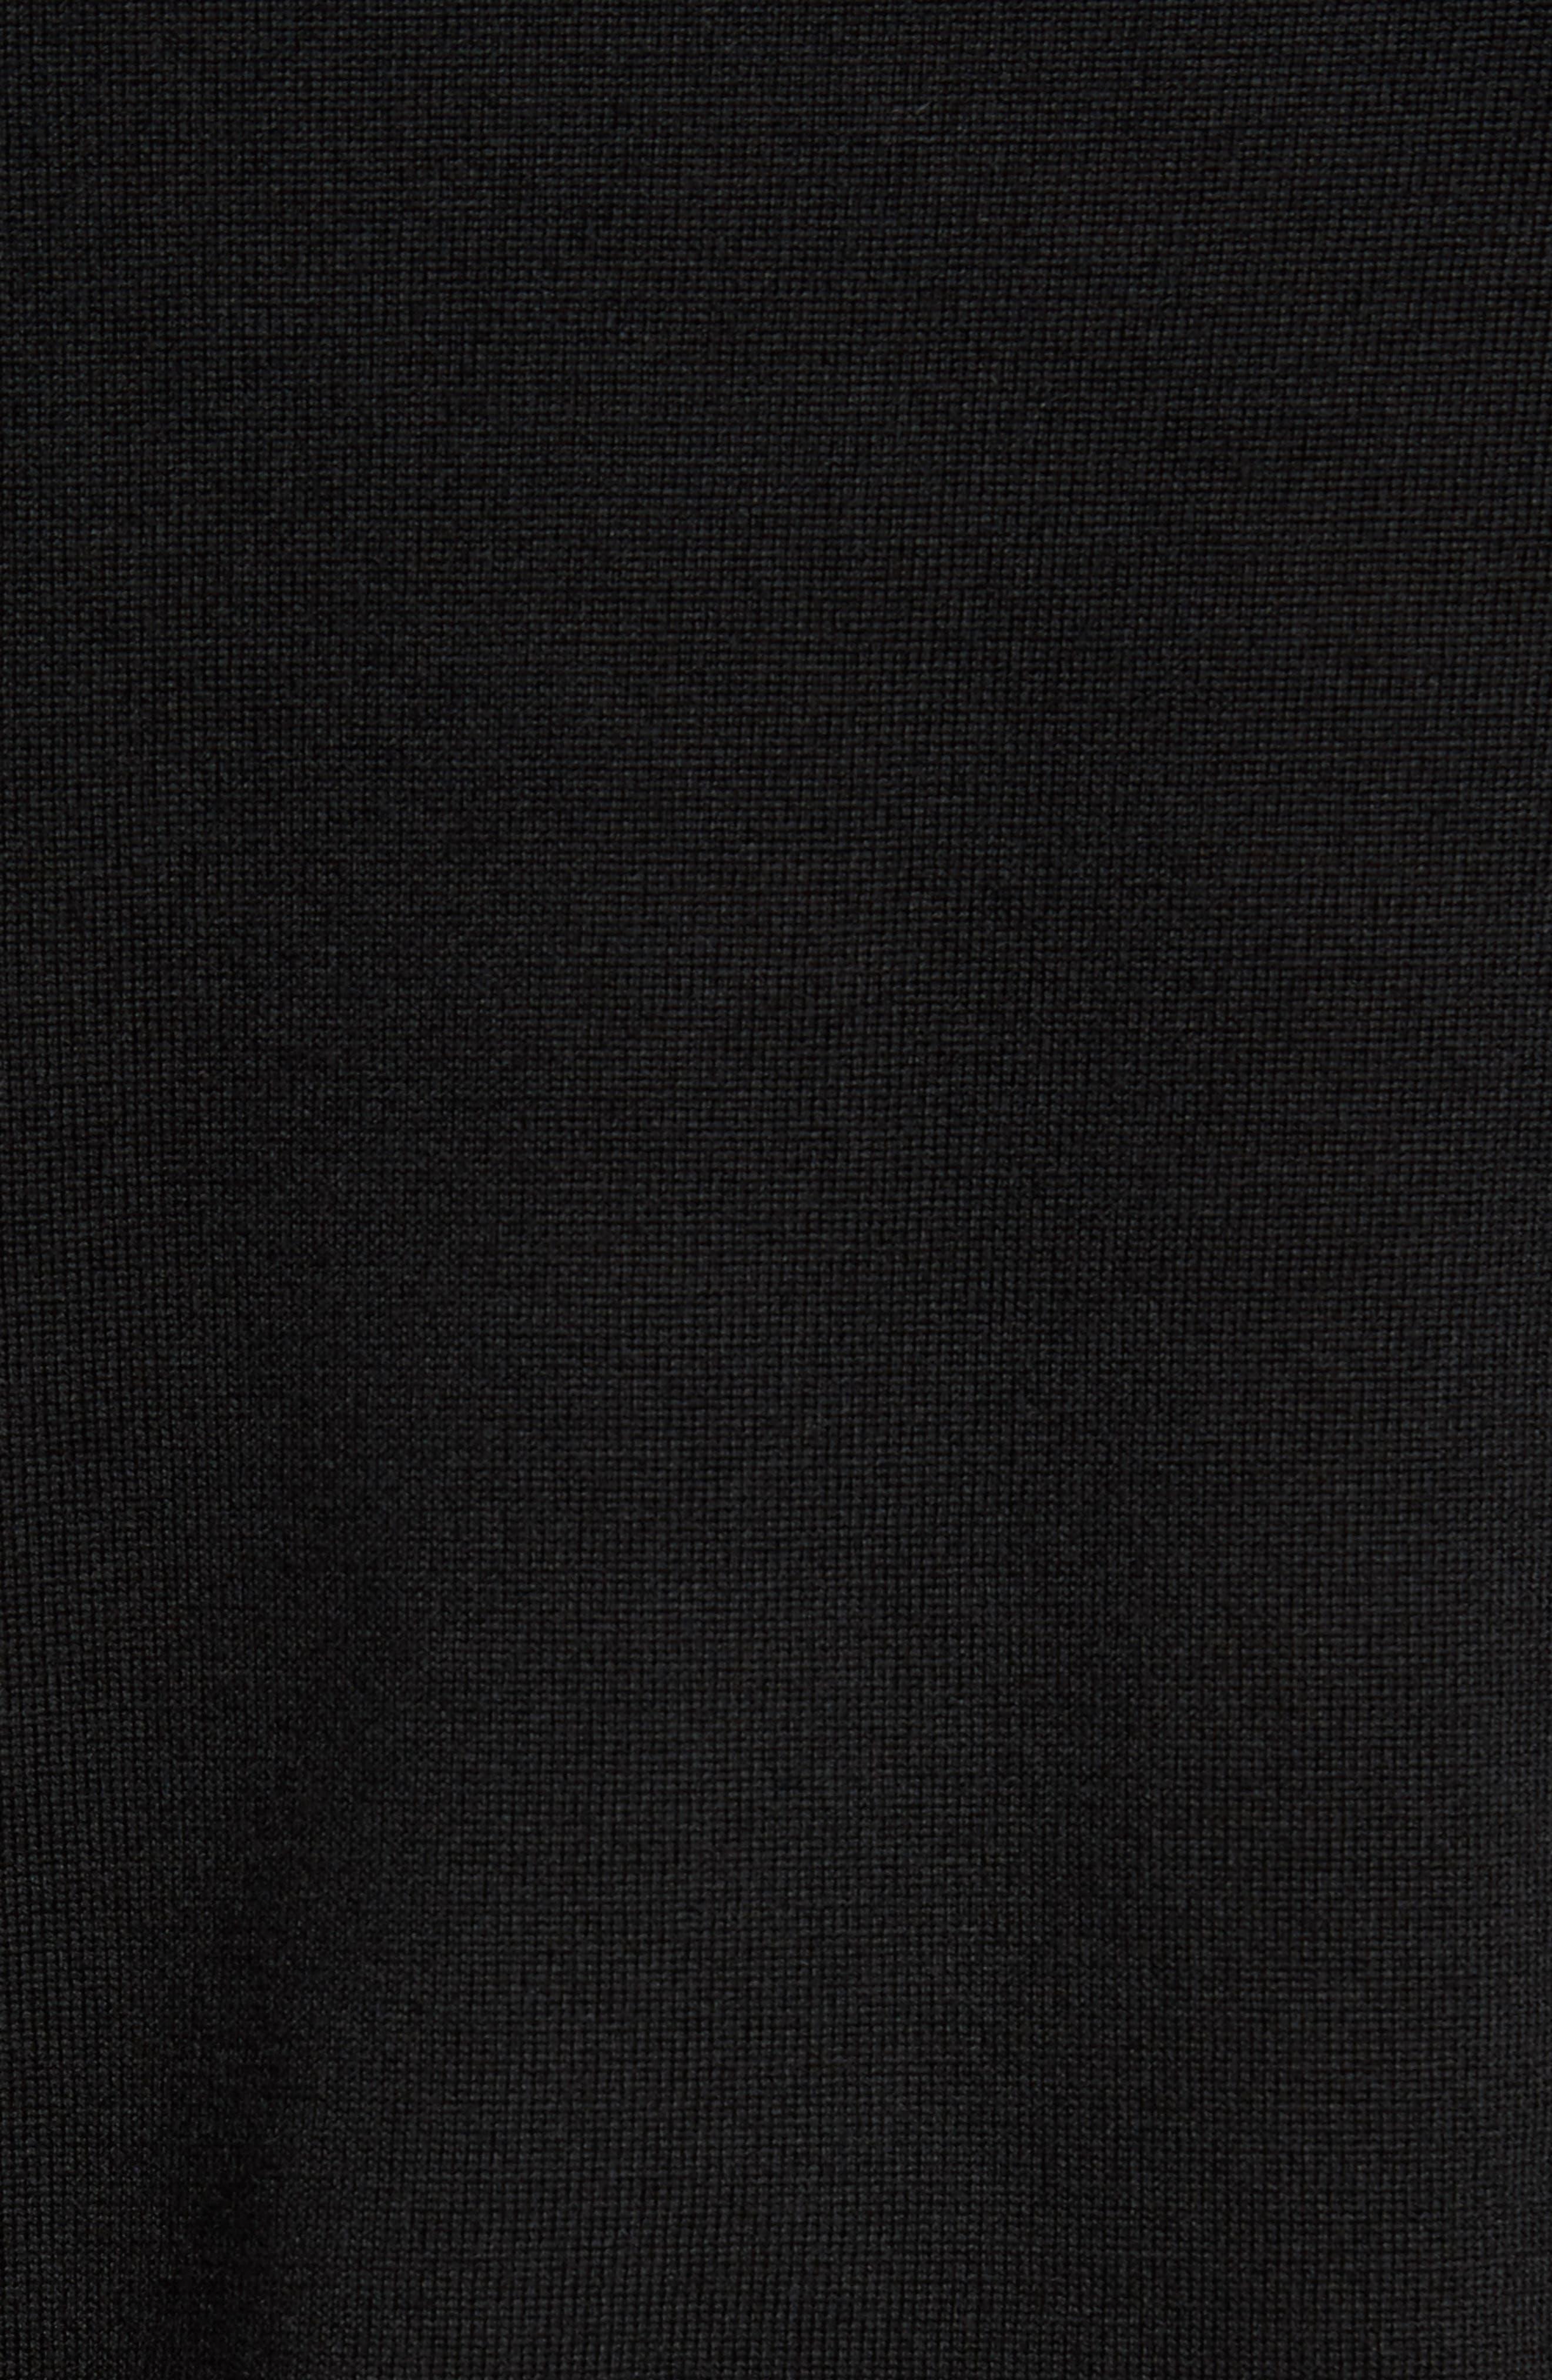 Crewneck Merino Wool Sweater,                             Alternate thumbnail 5, color,                             BLACK CAVIAR